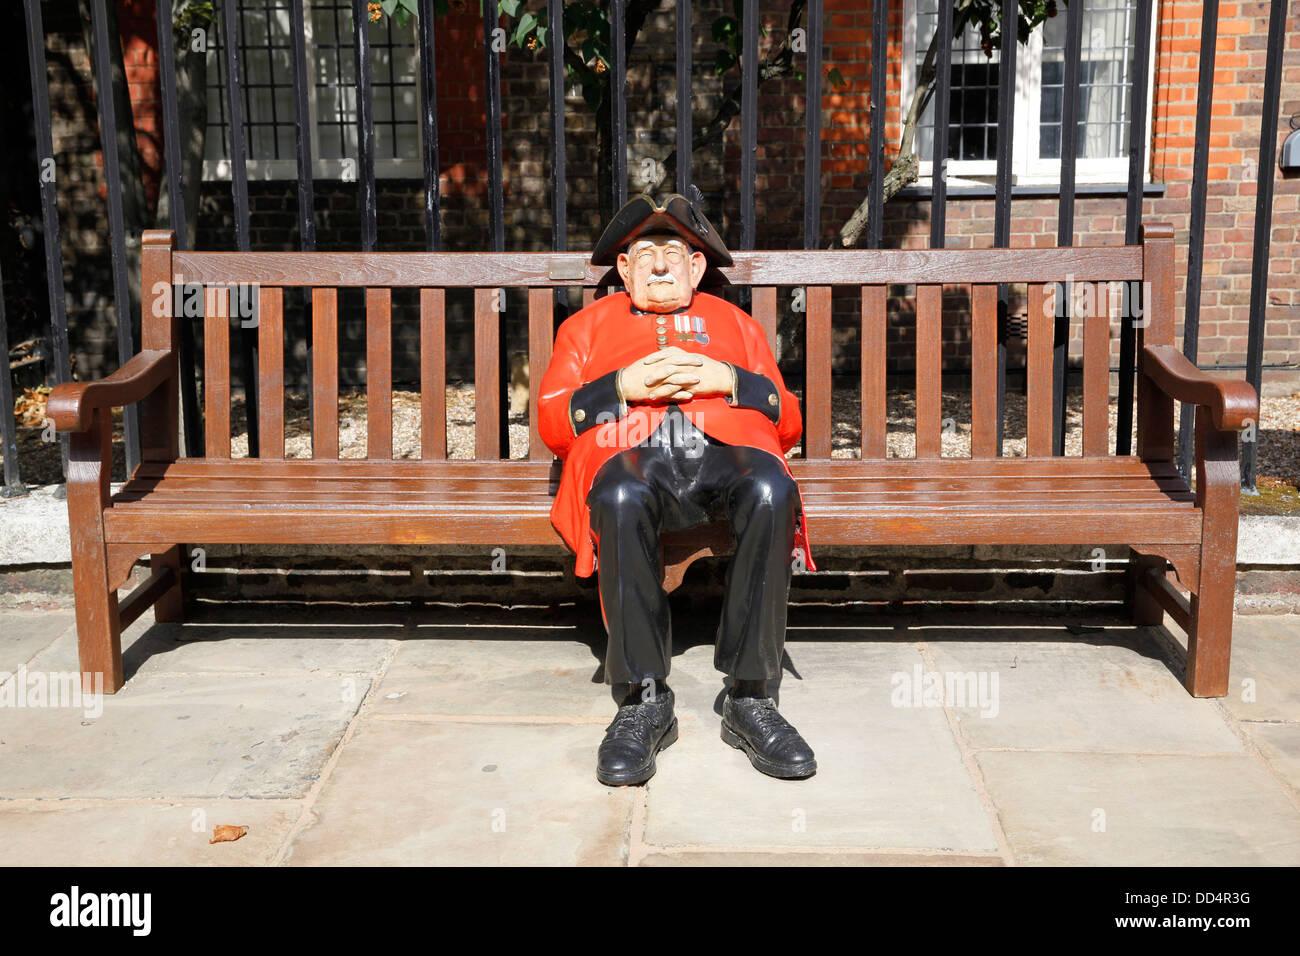 Statue von Chelsea Rentner sitzt außerhalb des Royal Hospital in Chelsea, London Stockbild